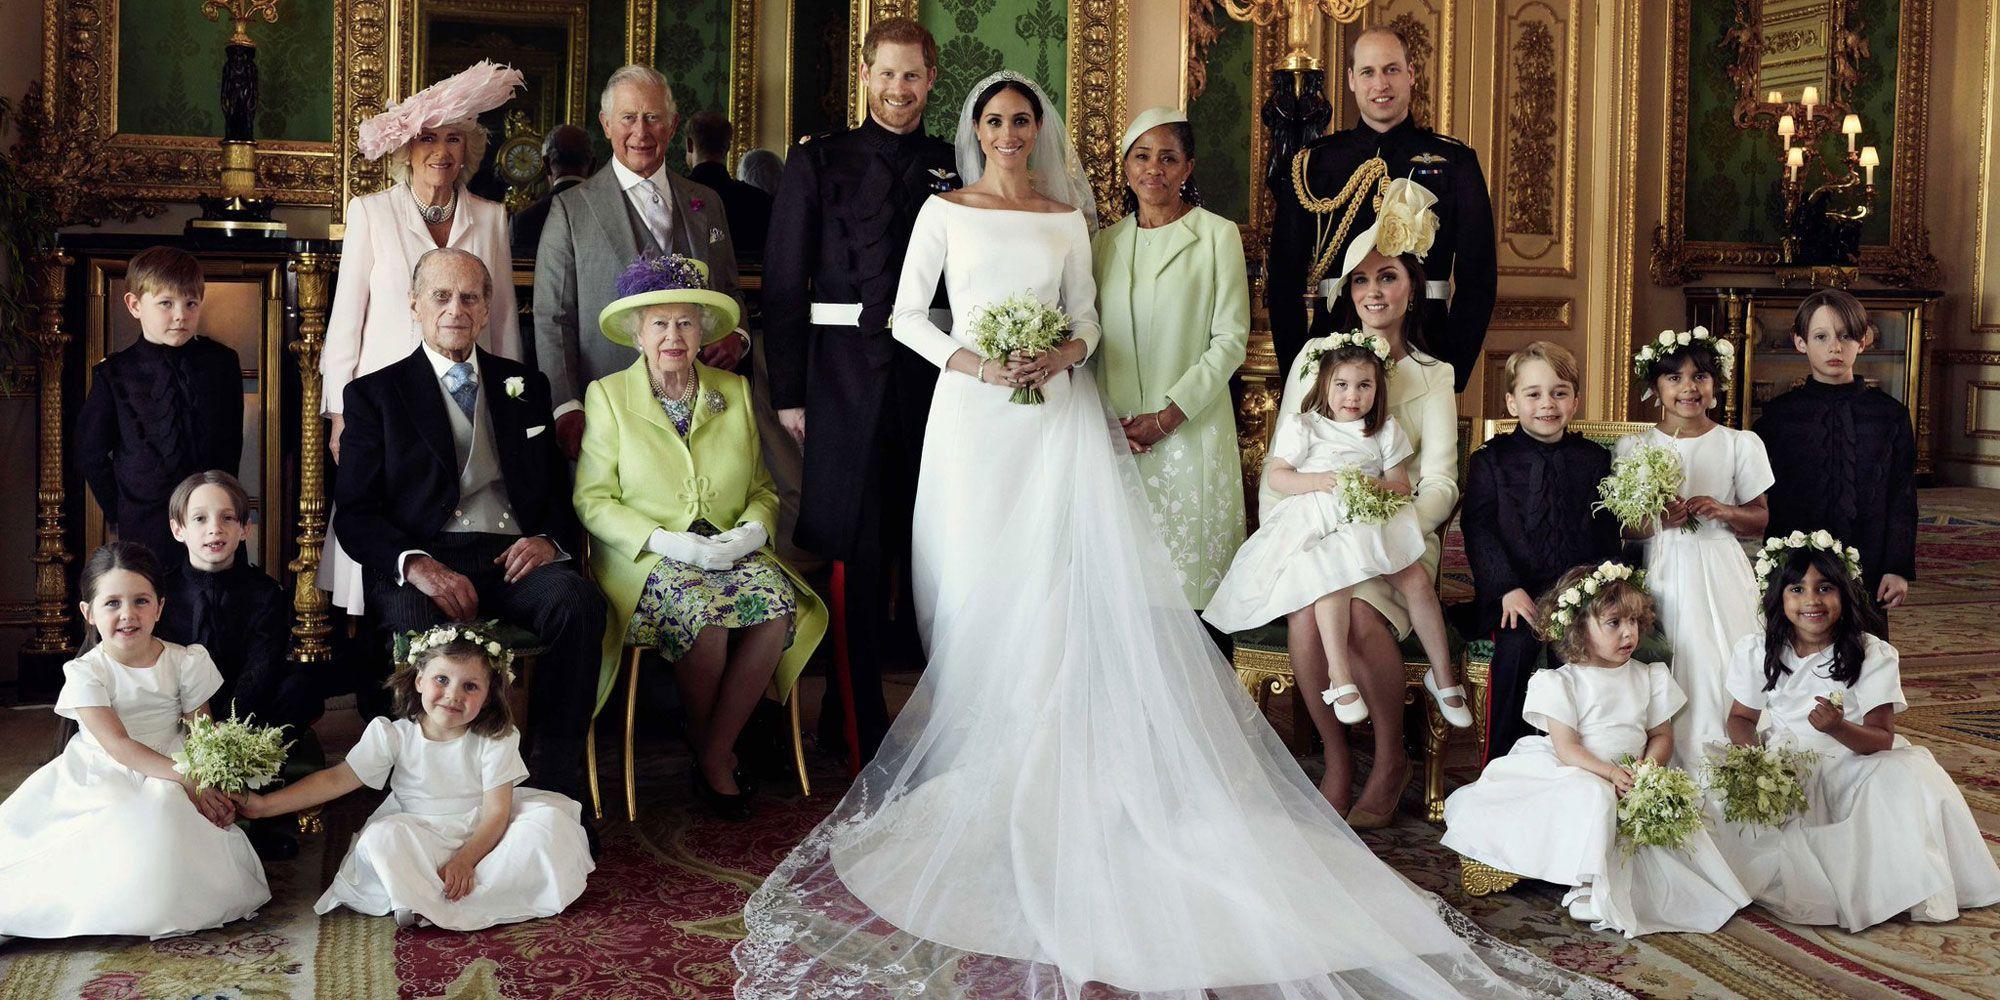 Mariage de Meghan et Harry